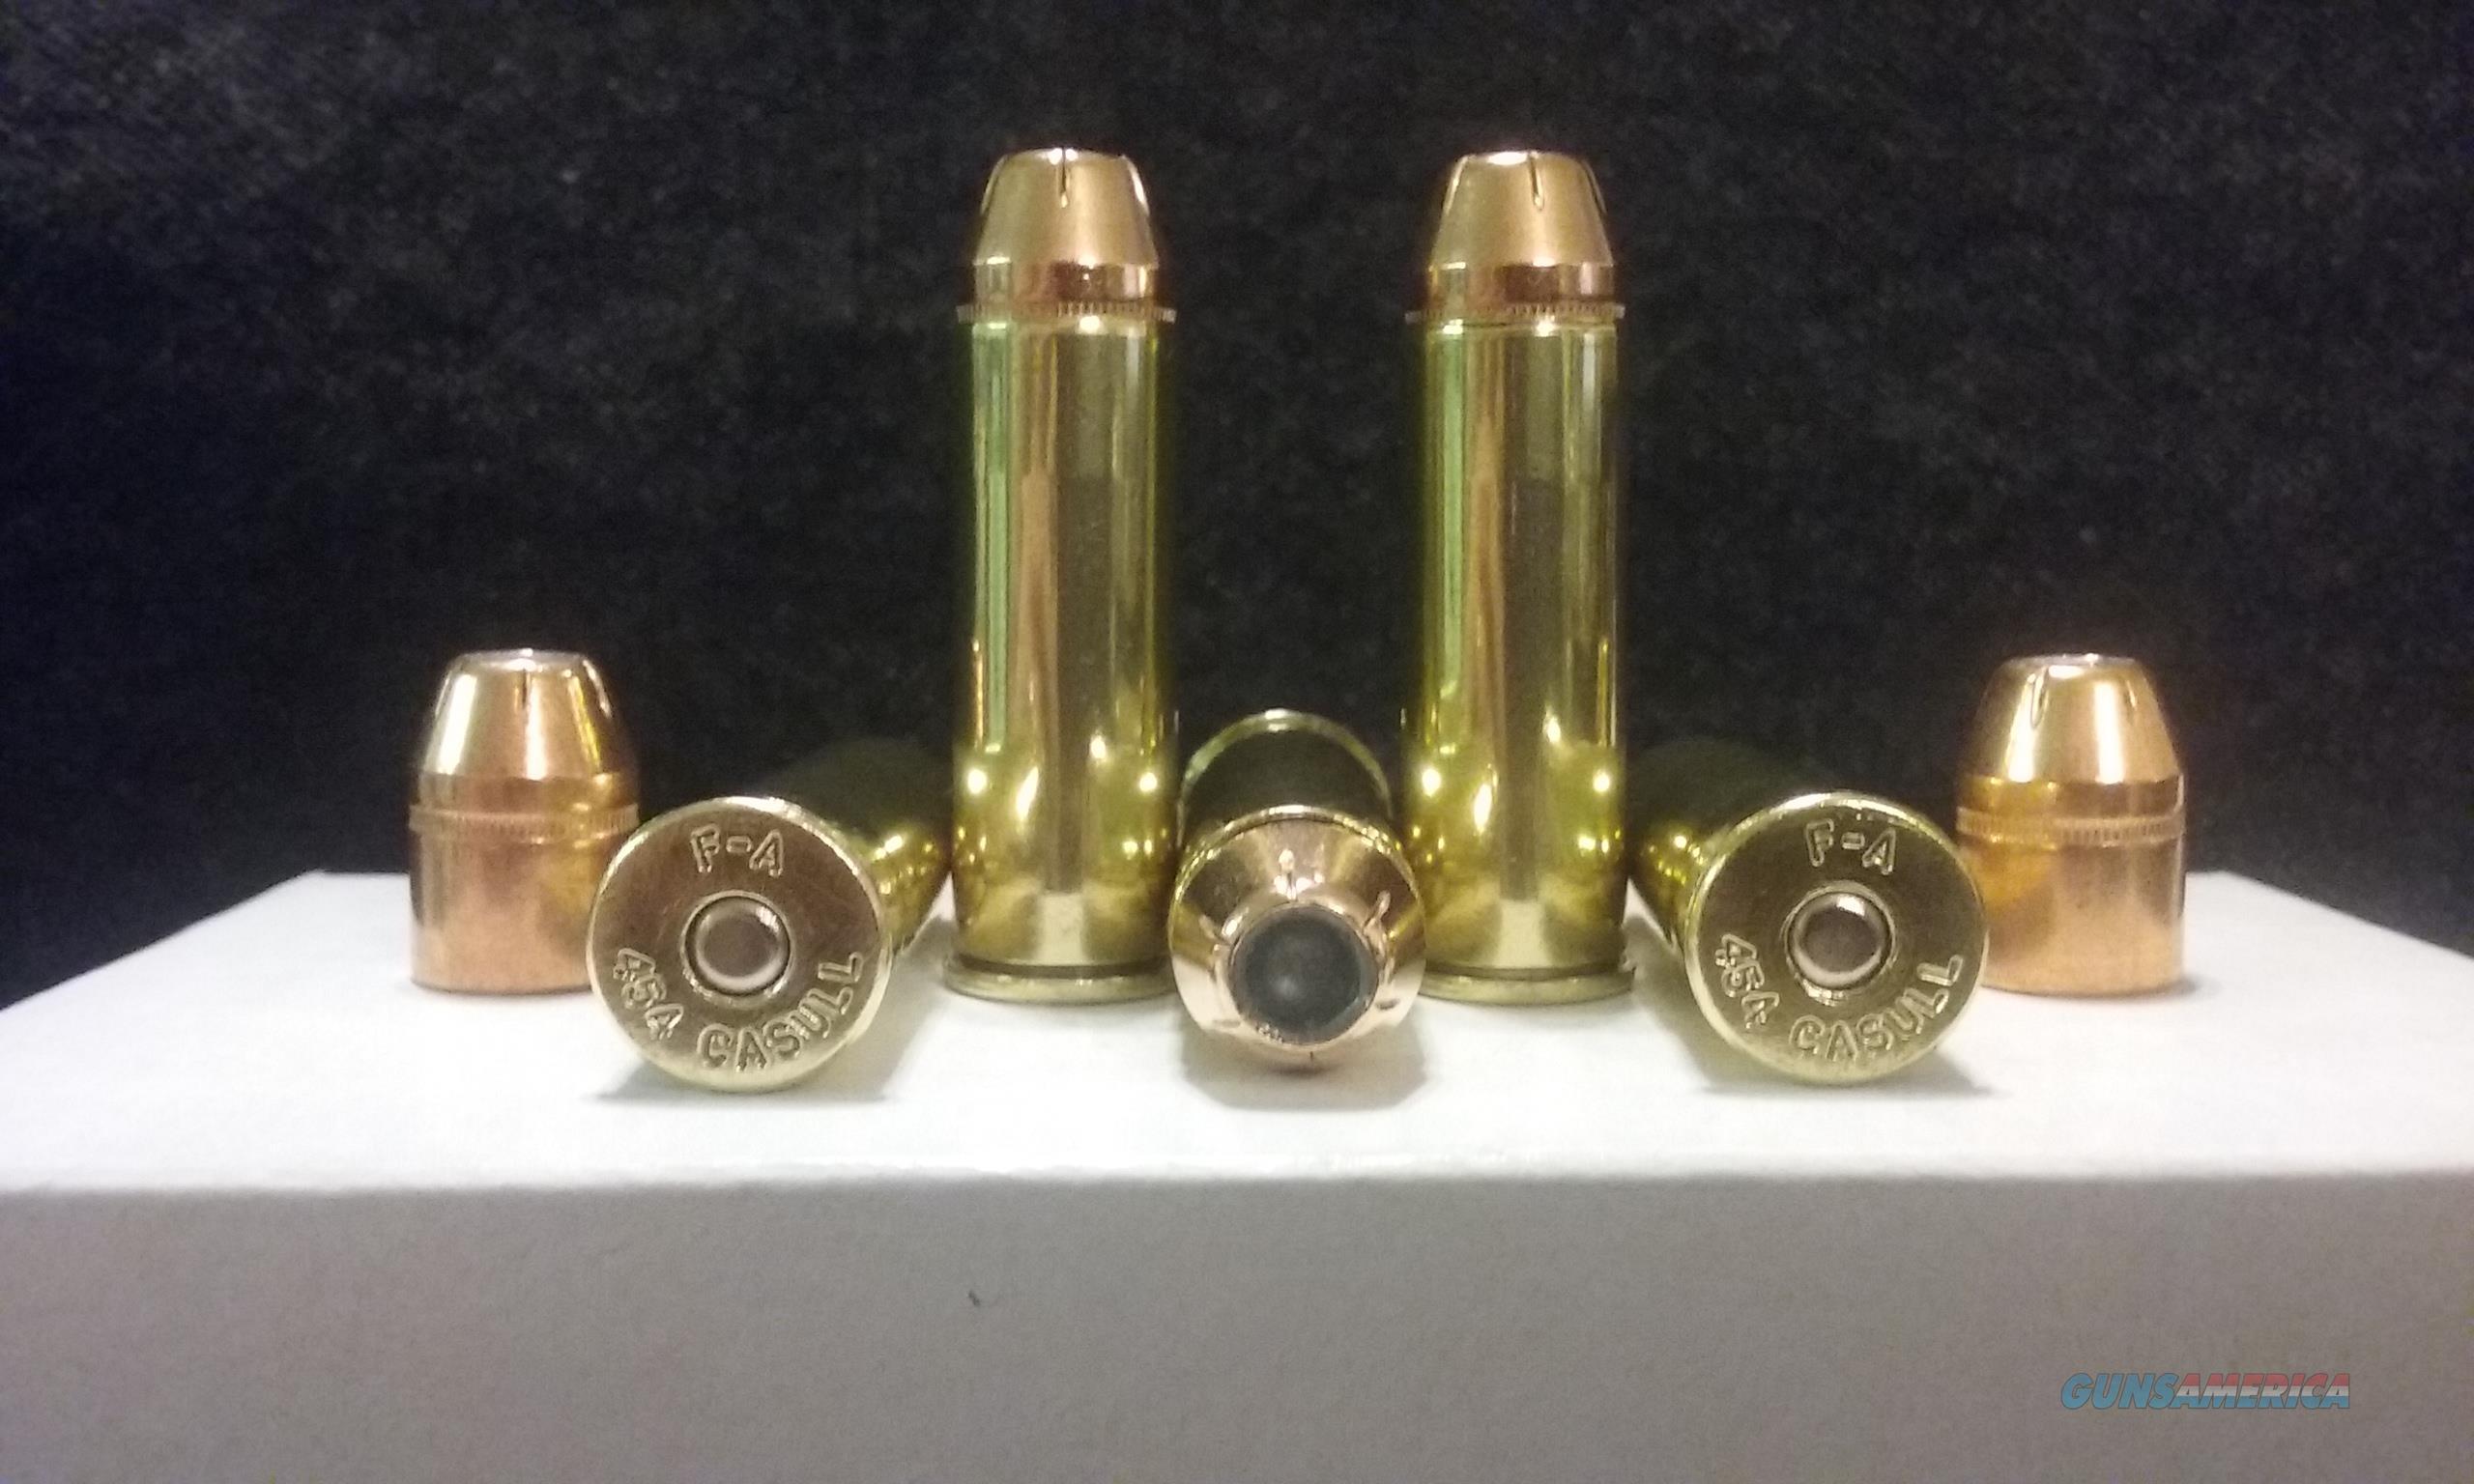 454 Casull Ammo.  Non-Guns > Ammunition